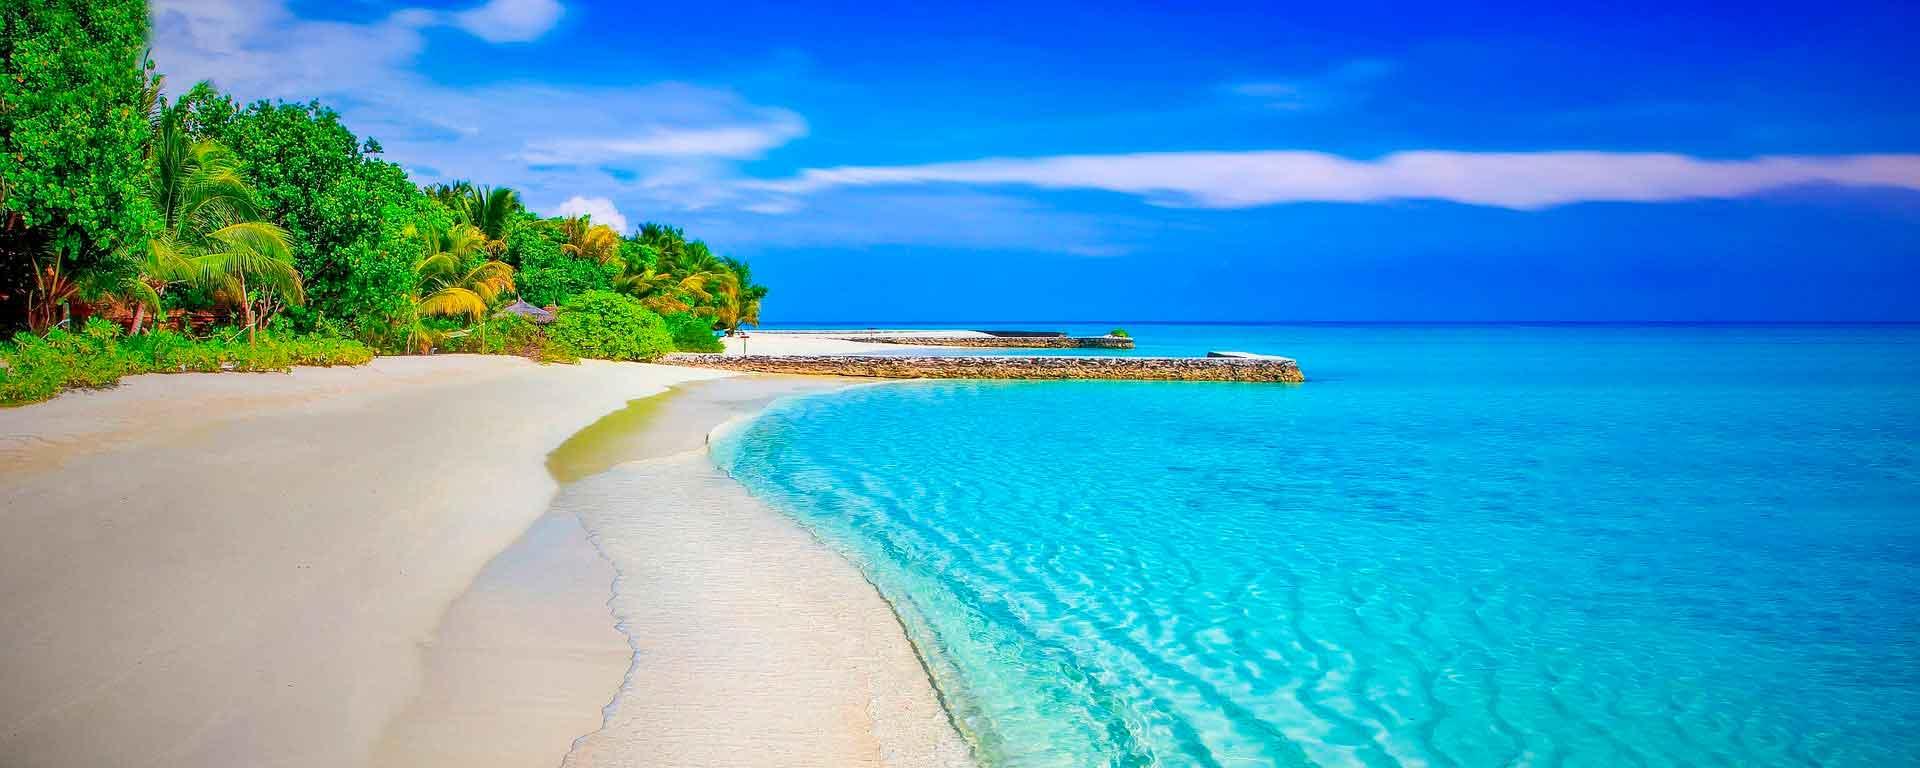 Playas mexicanas azúl